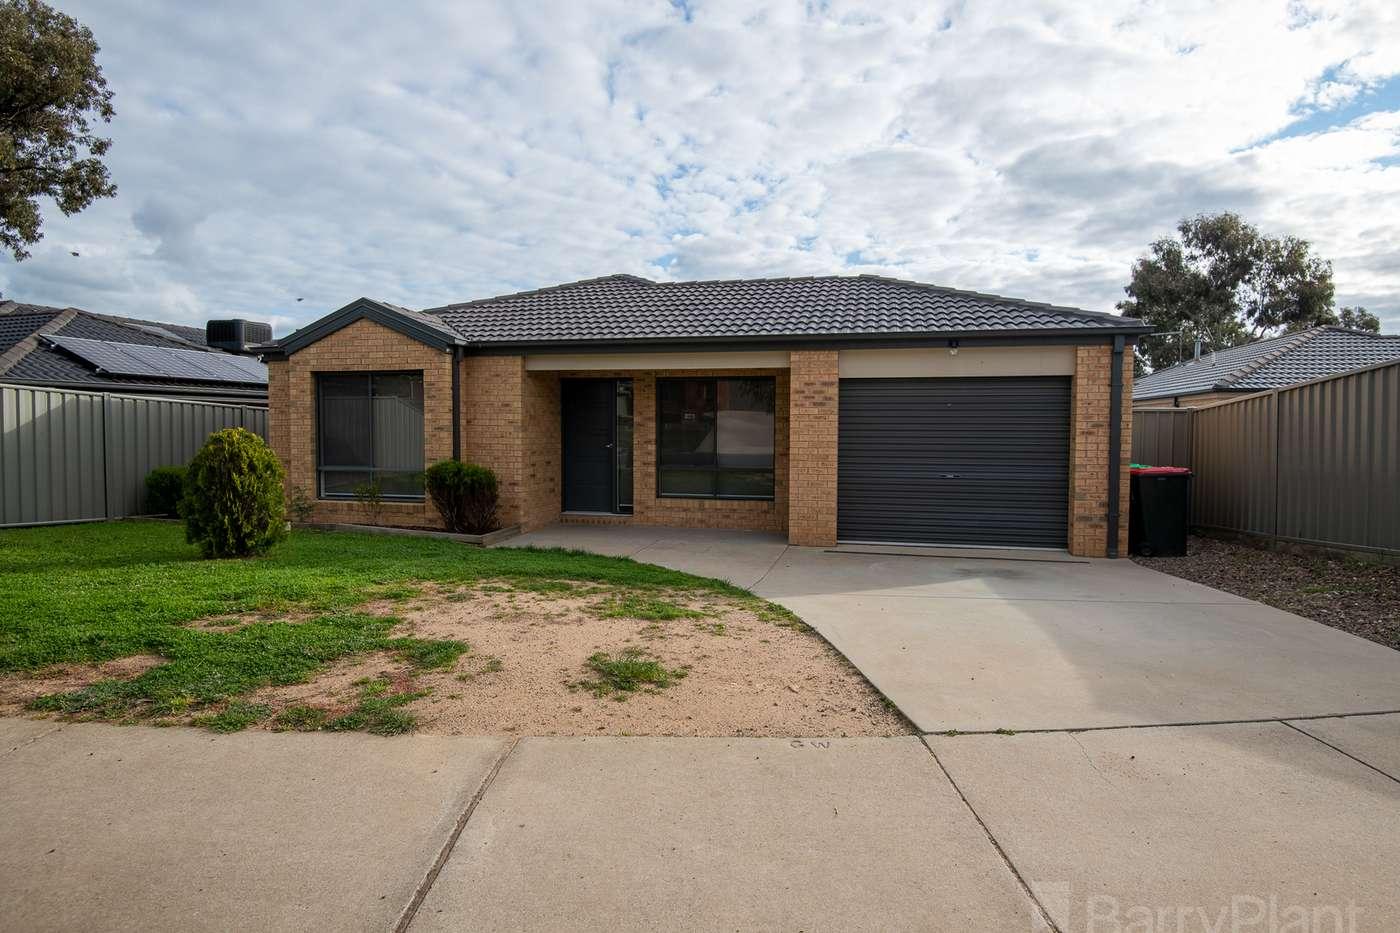 Main view of Homely house listing, 21 Freeman Drive, Kangaroo Flat, VIC 3555